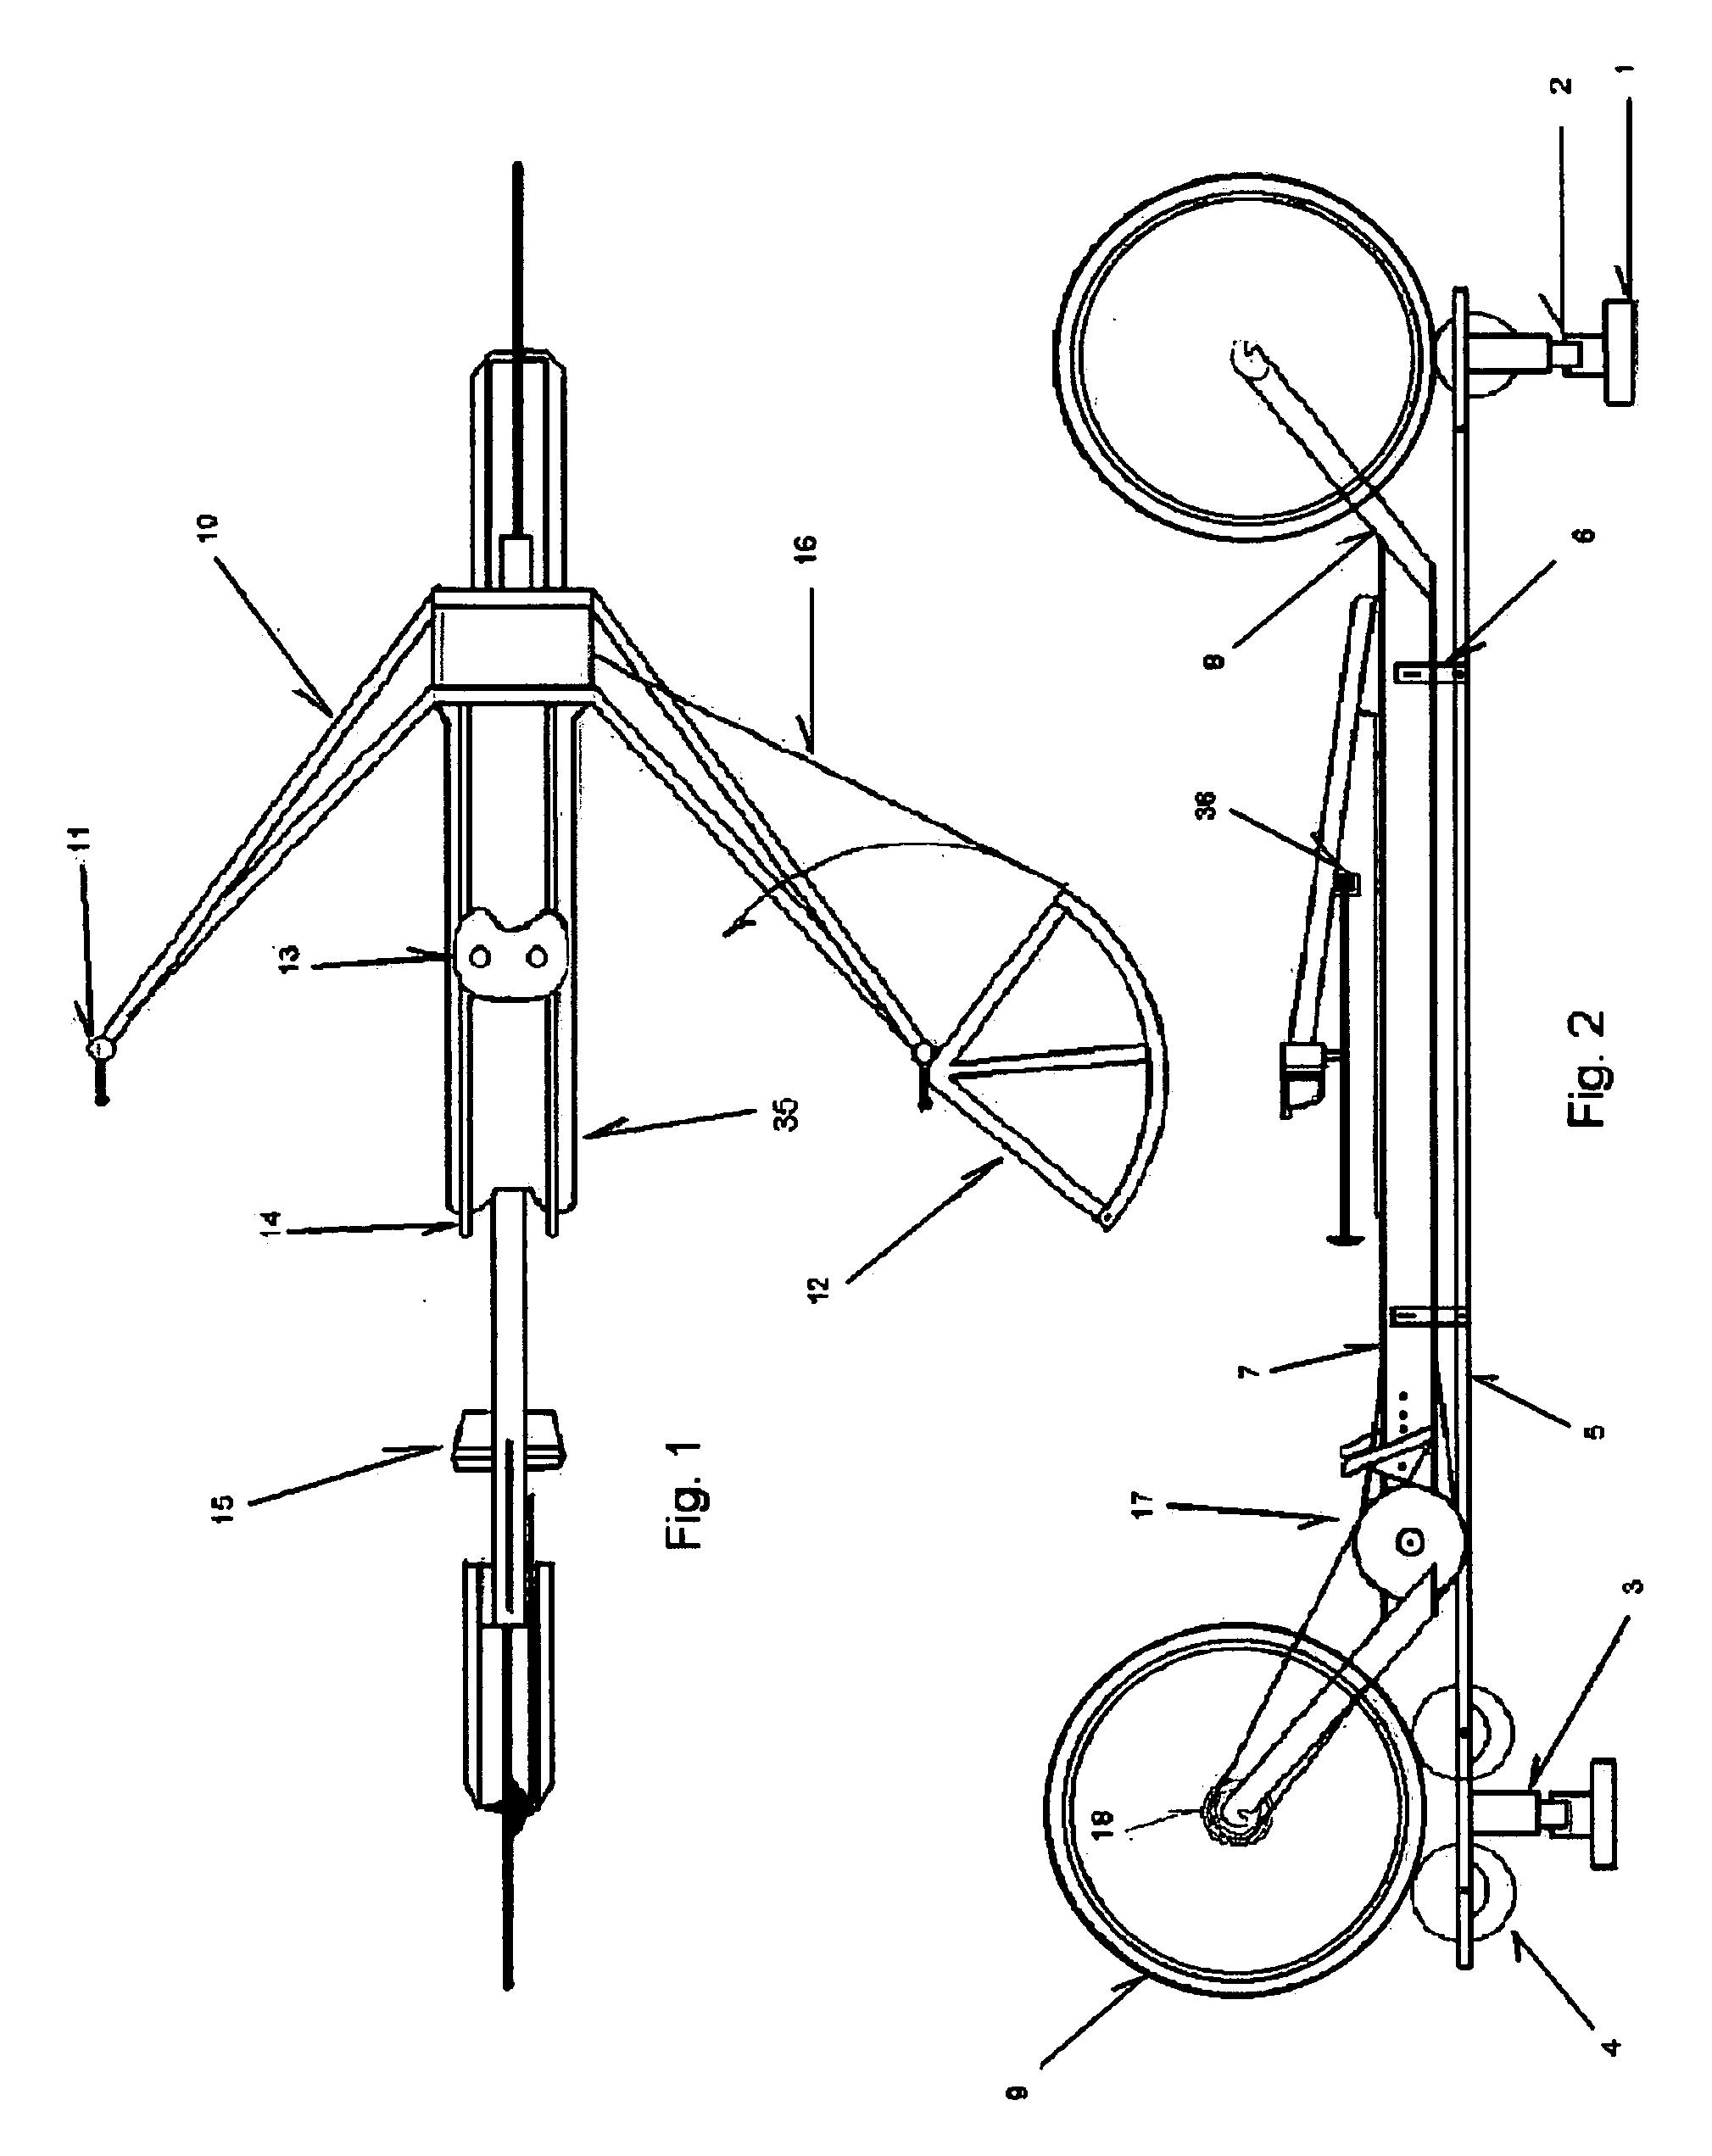 17 Mako Center Console Wiring Diagram. . Wiring Diagram Maco Boat Wiring Diagrams Schematics on